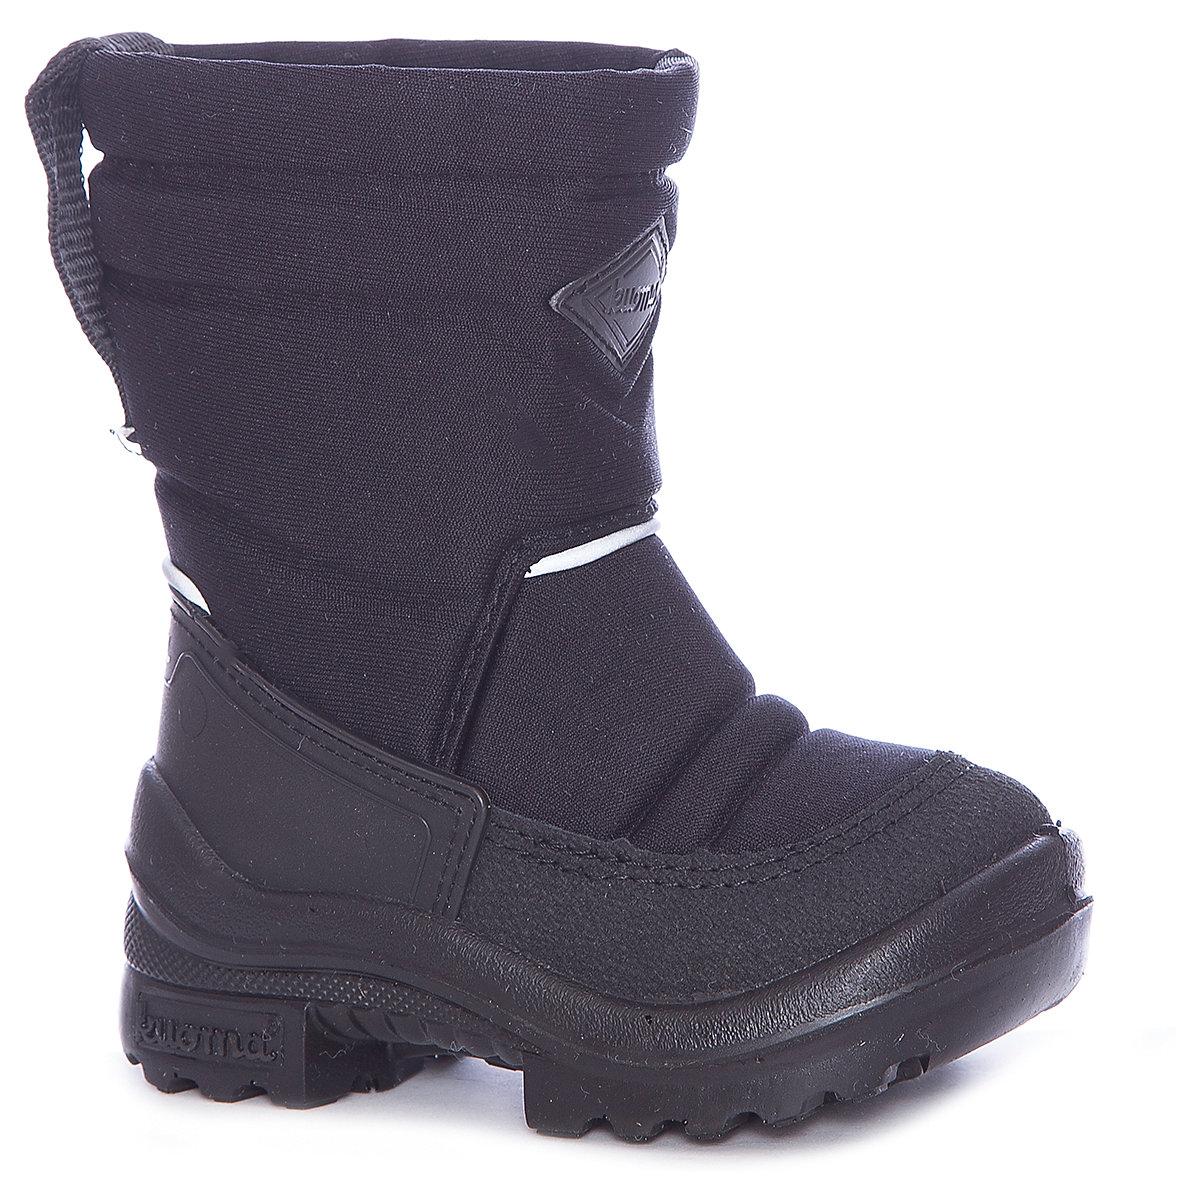 Boots KUOMA for boys 7118640 Valenki Uggi Winter Baby Kids Children shoes doratasia big size 34 43 women half knee high boots vintage flat heels warm winter fur shoes round toe platform snow boots